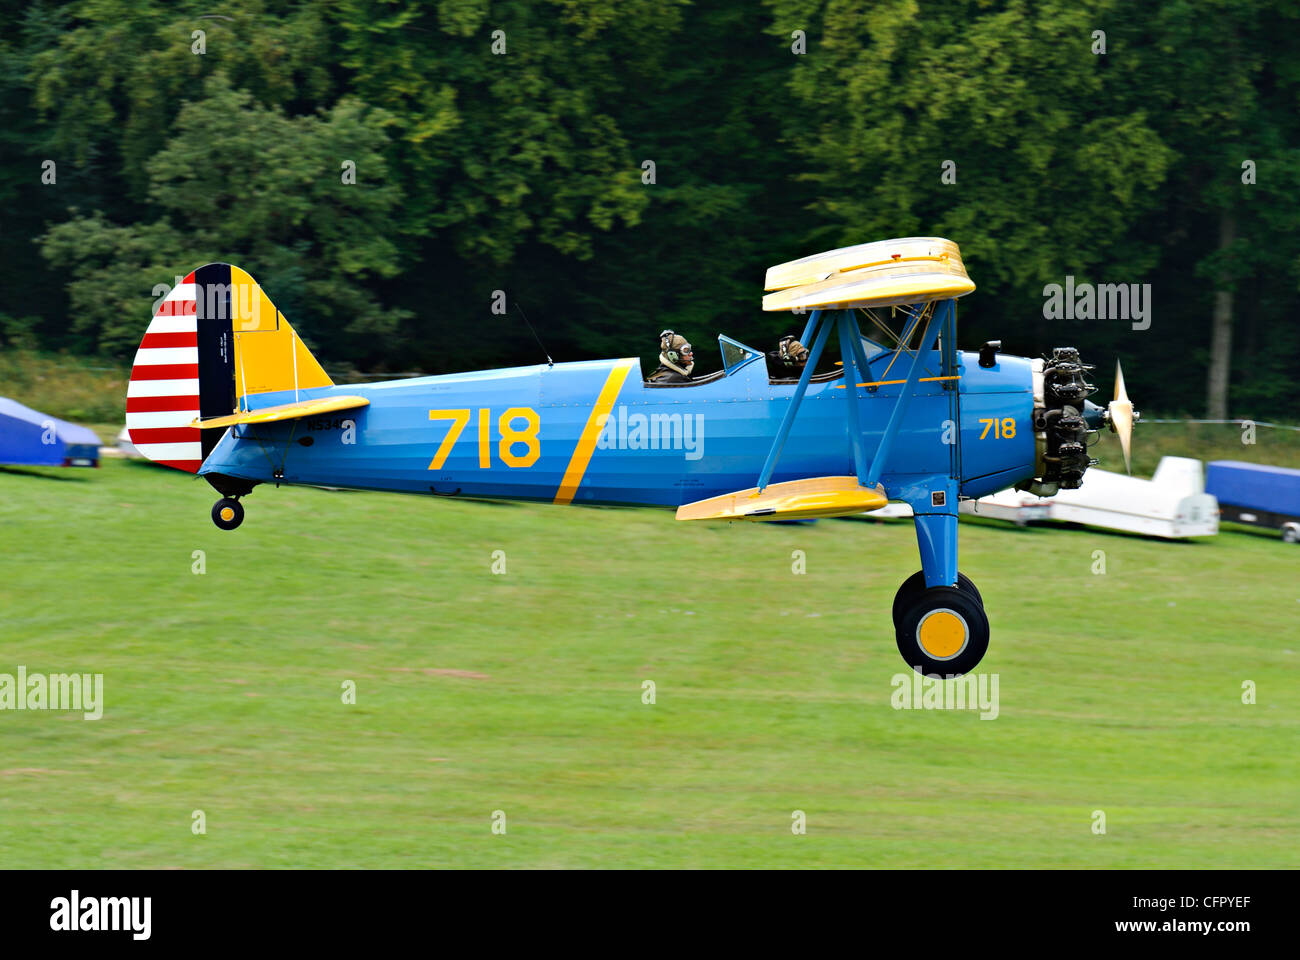 Boeing-Stearman PT-17 biplane landing at the Hahnweide vintage air show, Kirchheim-Teck, Germany  CFPYEF - Stock Image